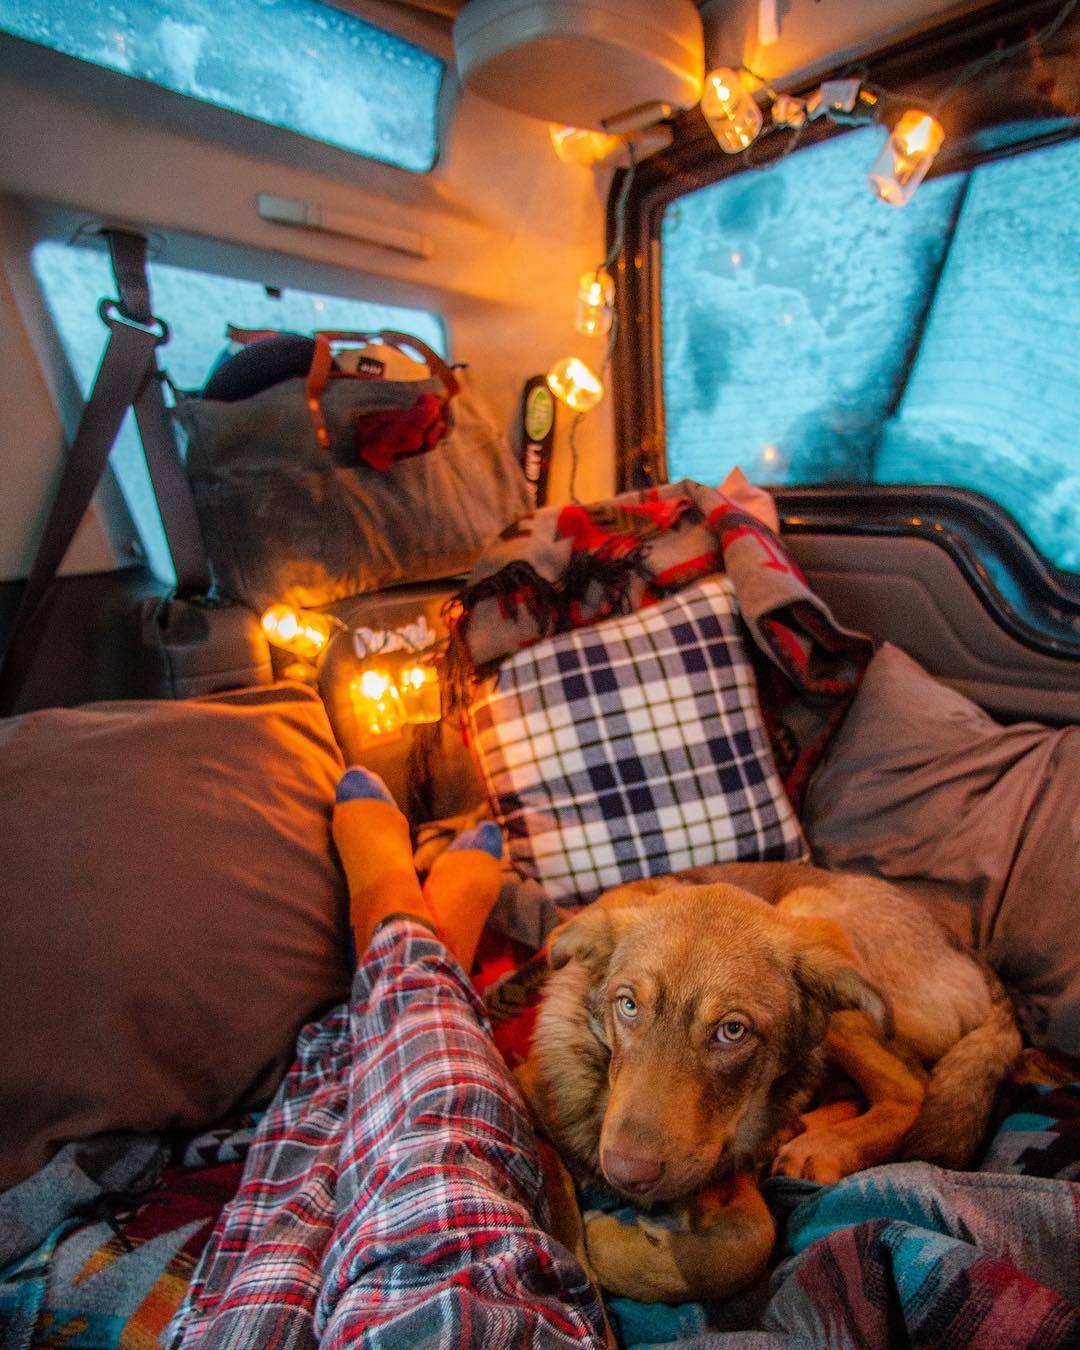 dog and man relaxing in camper van